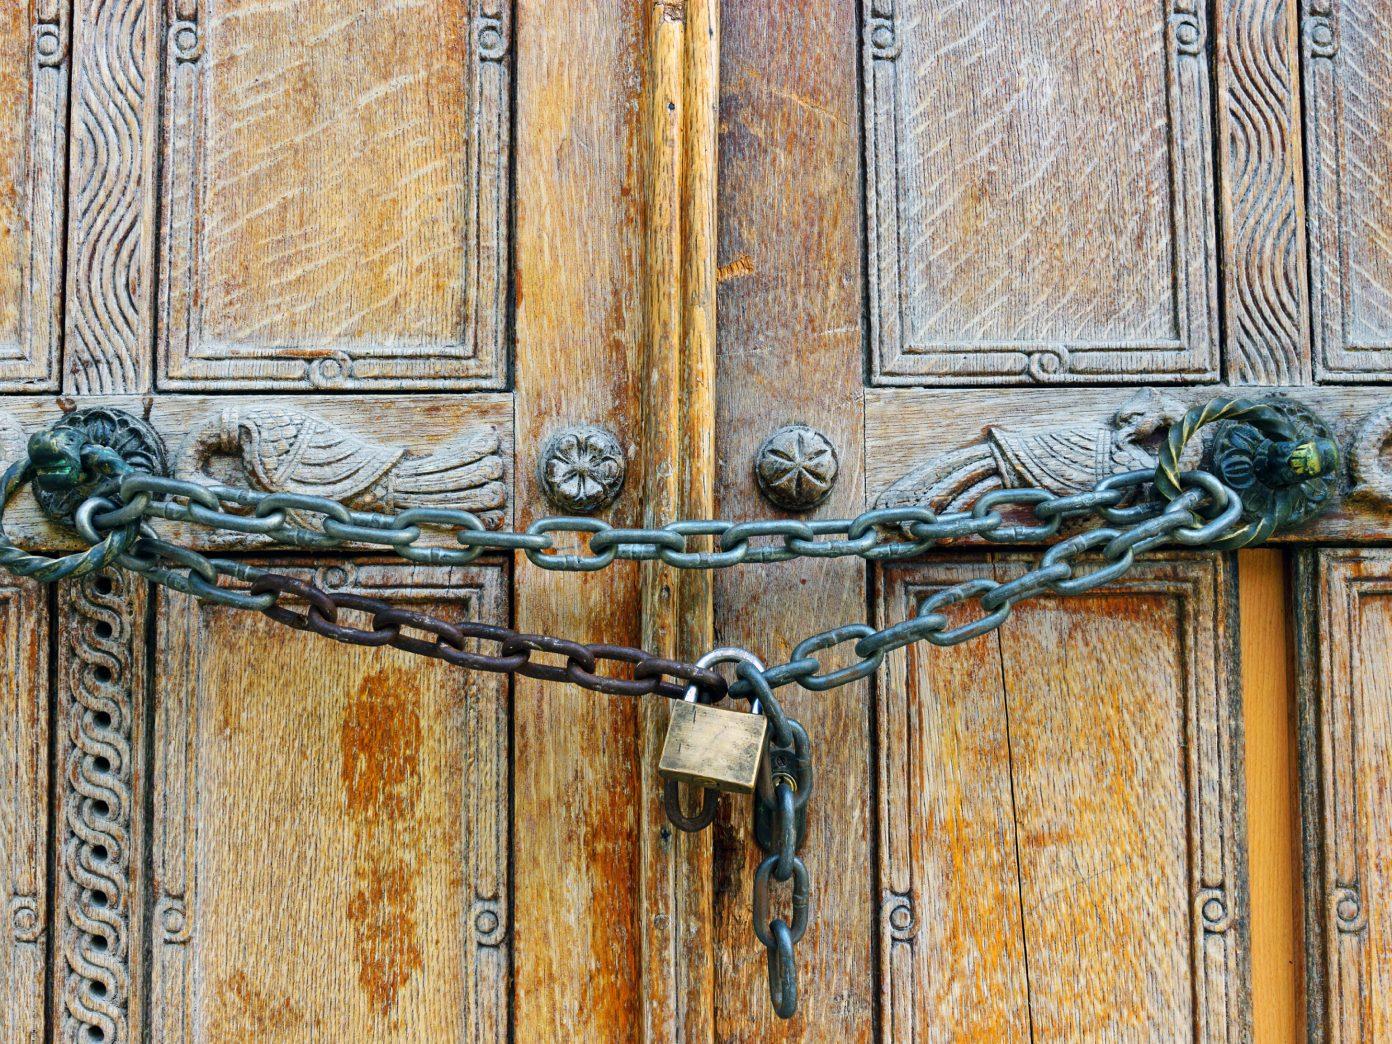 Bitcoin Exchange Gatecoin Shuts Down Citing Financial Difficulty